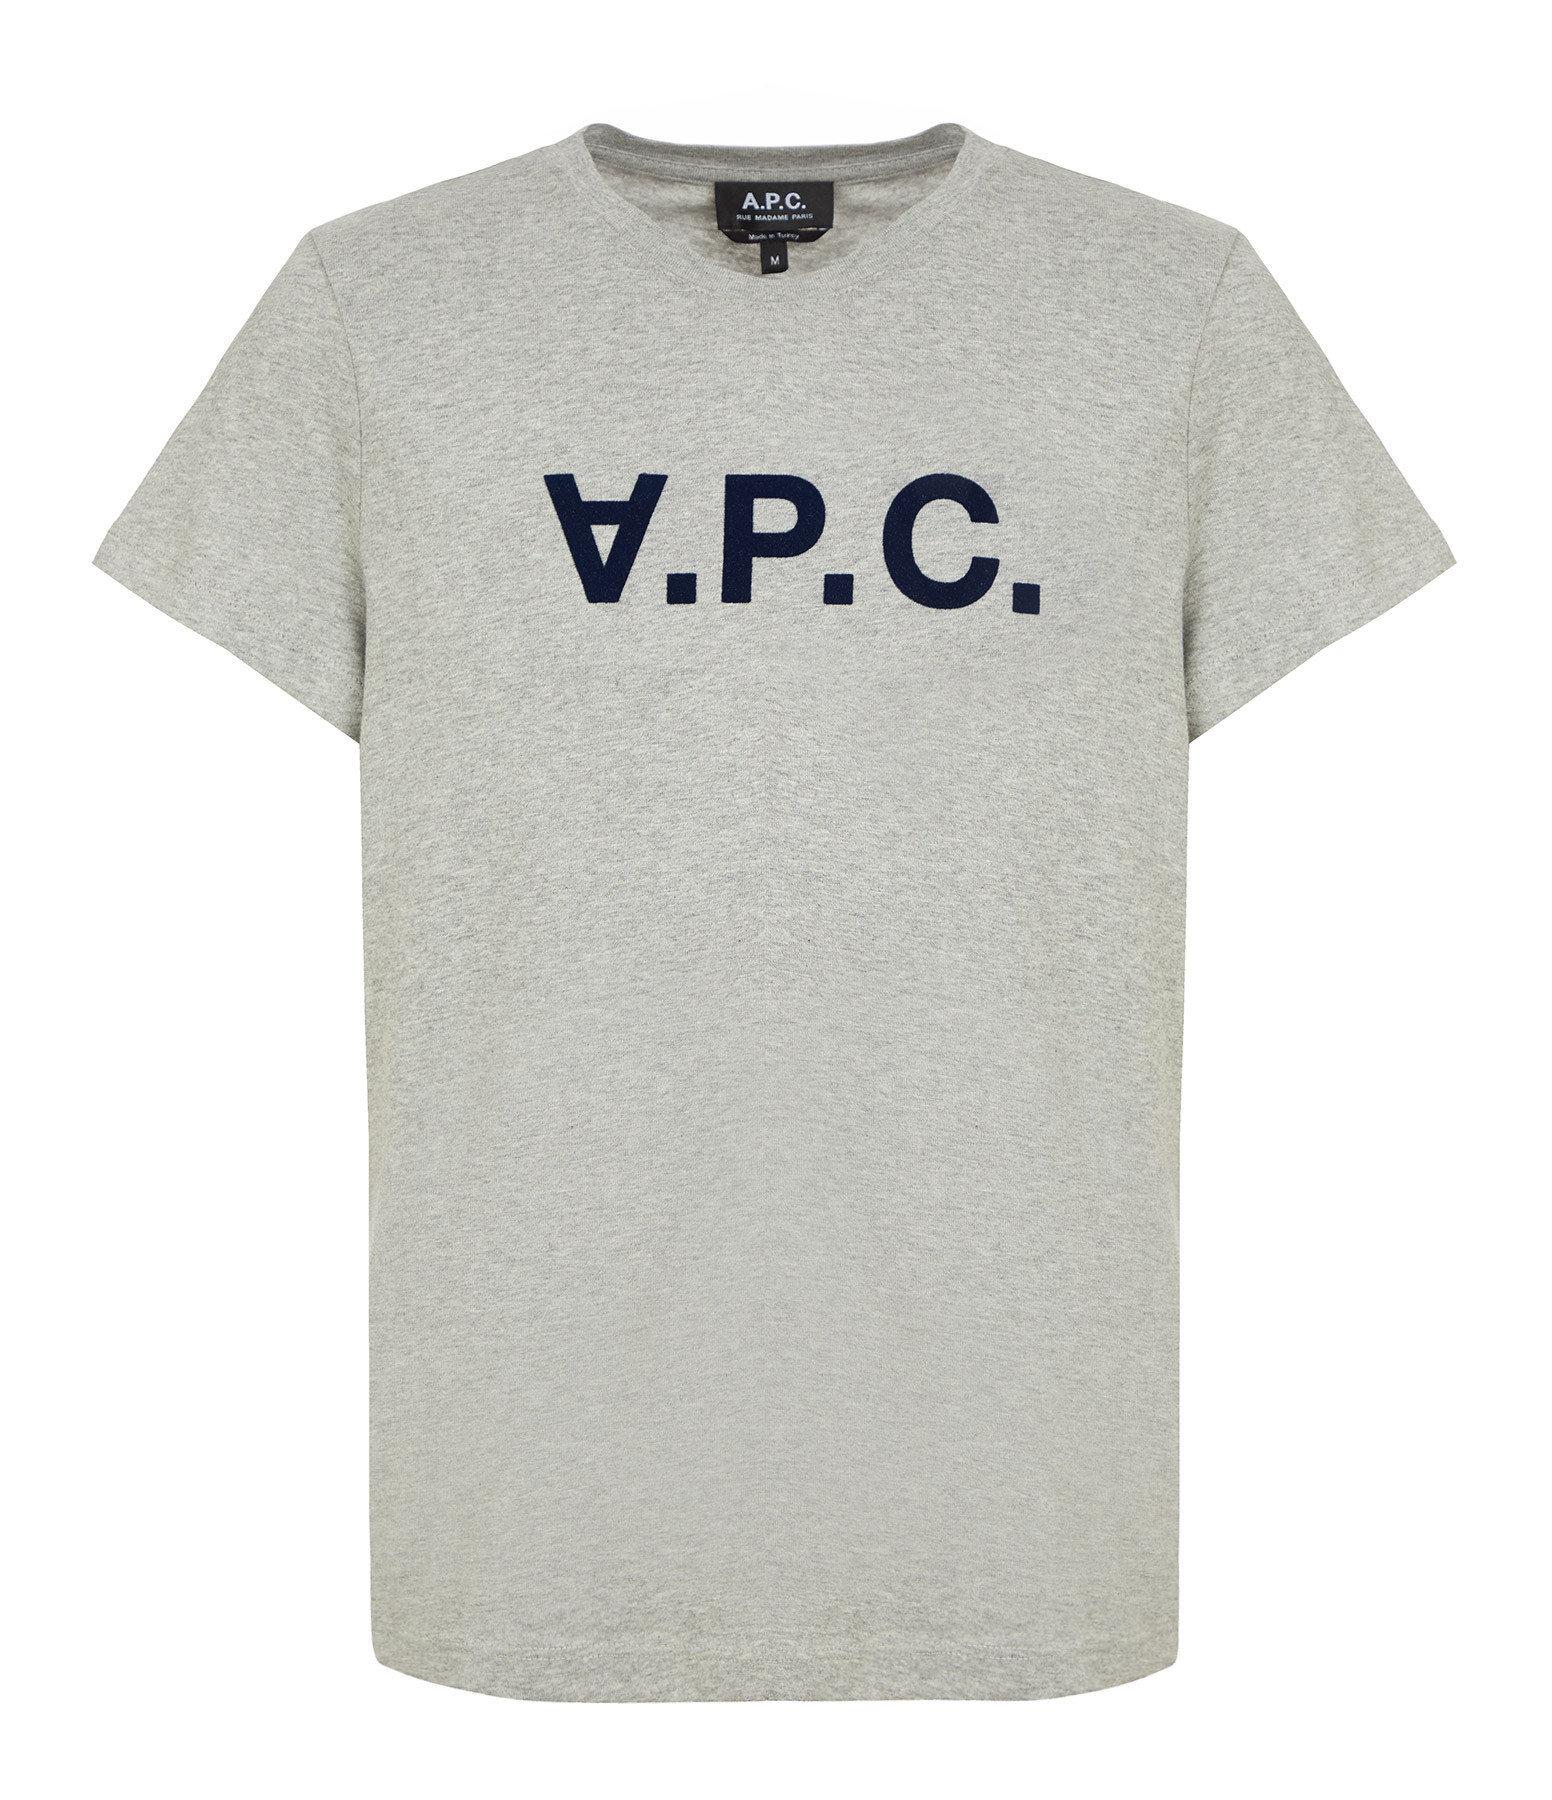 A.P.C. - Tee-shirt Gris Clair Chiné Noir